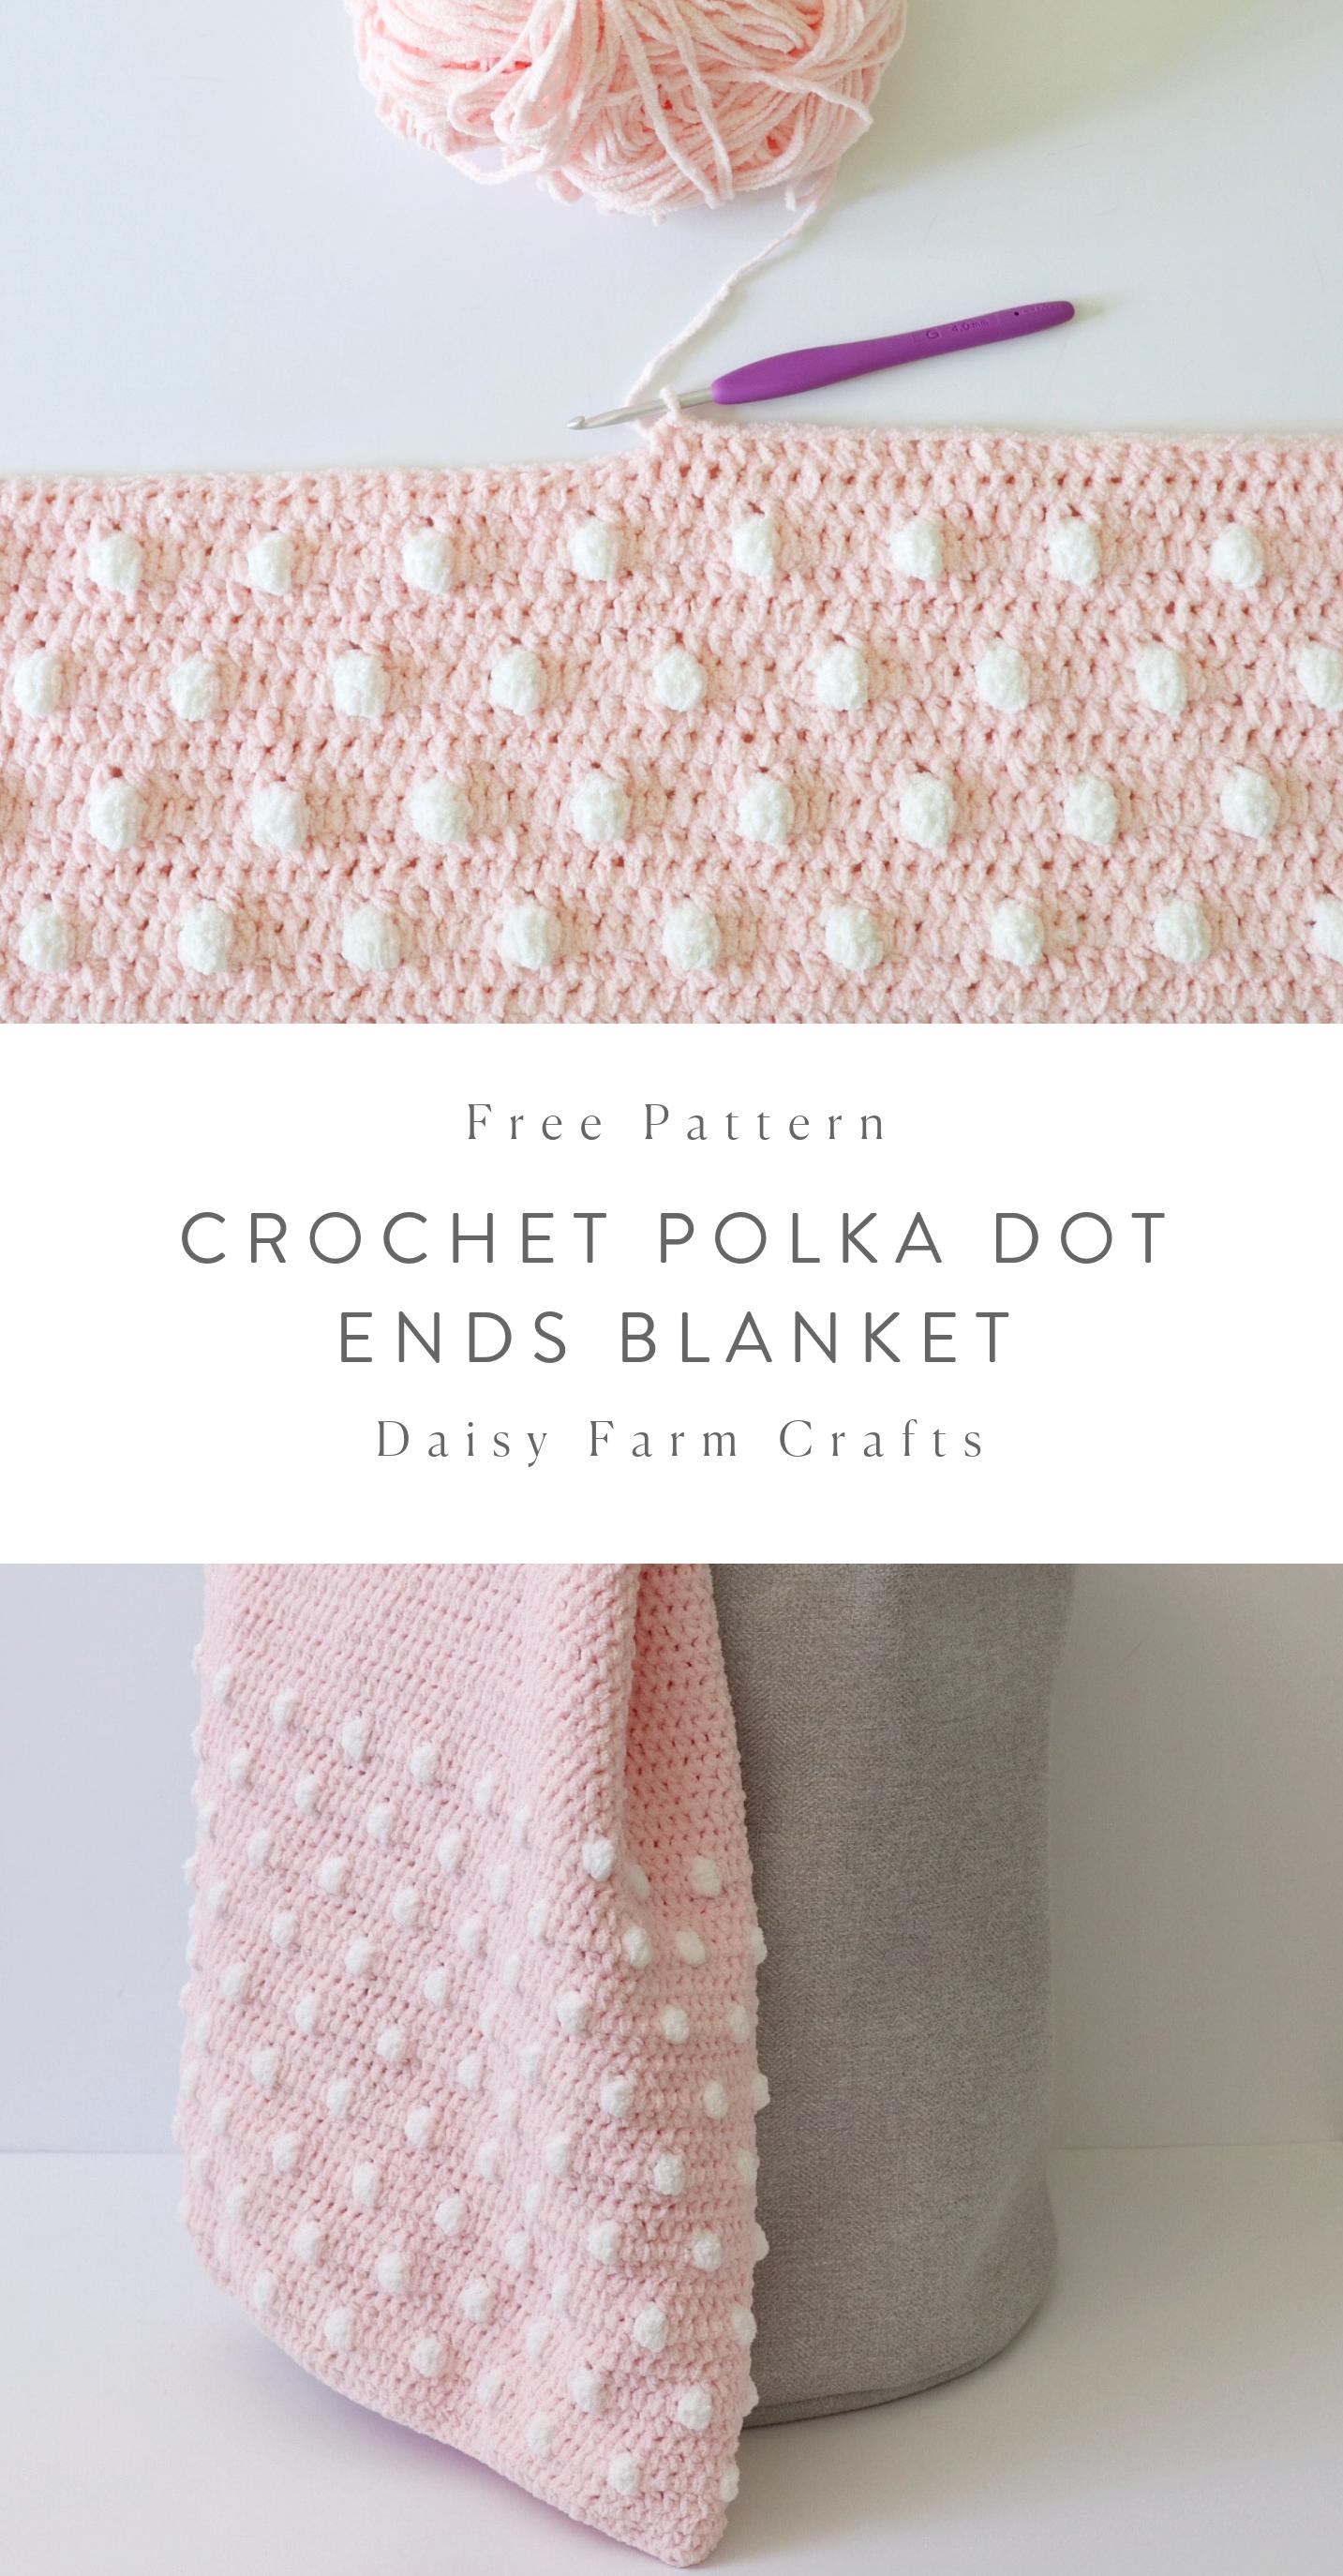 Free Pattern - Crochet Polka Dot Ends Blanket